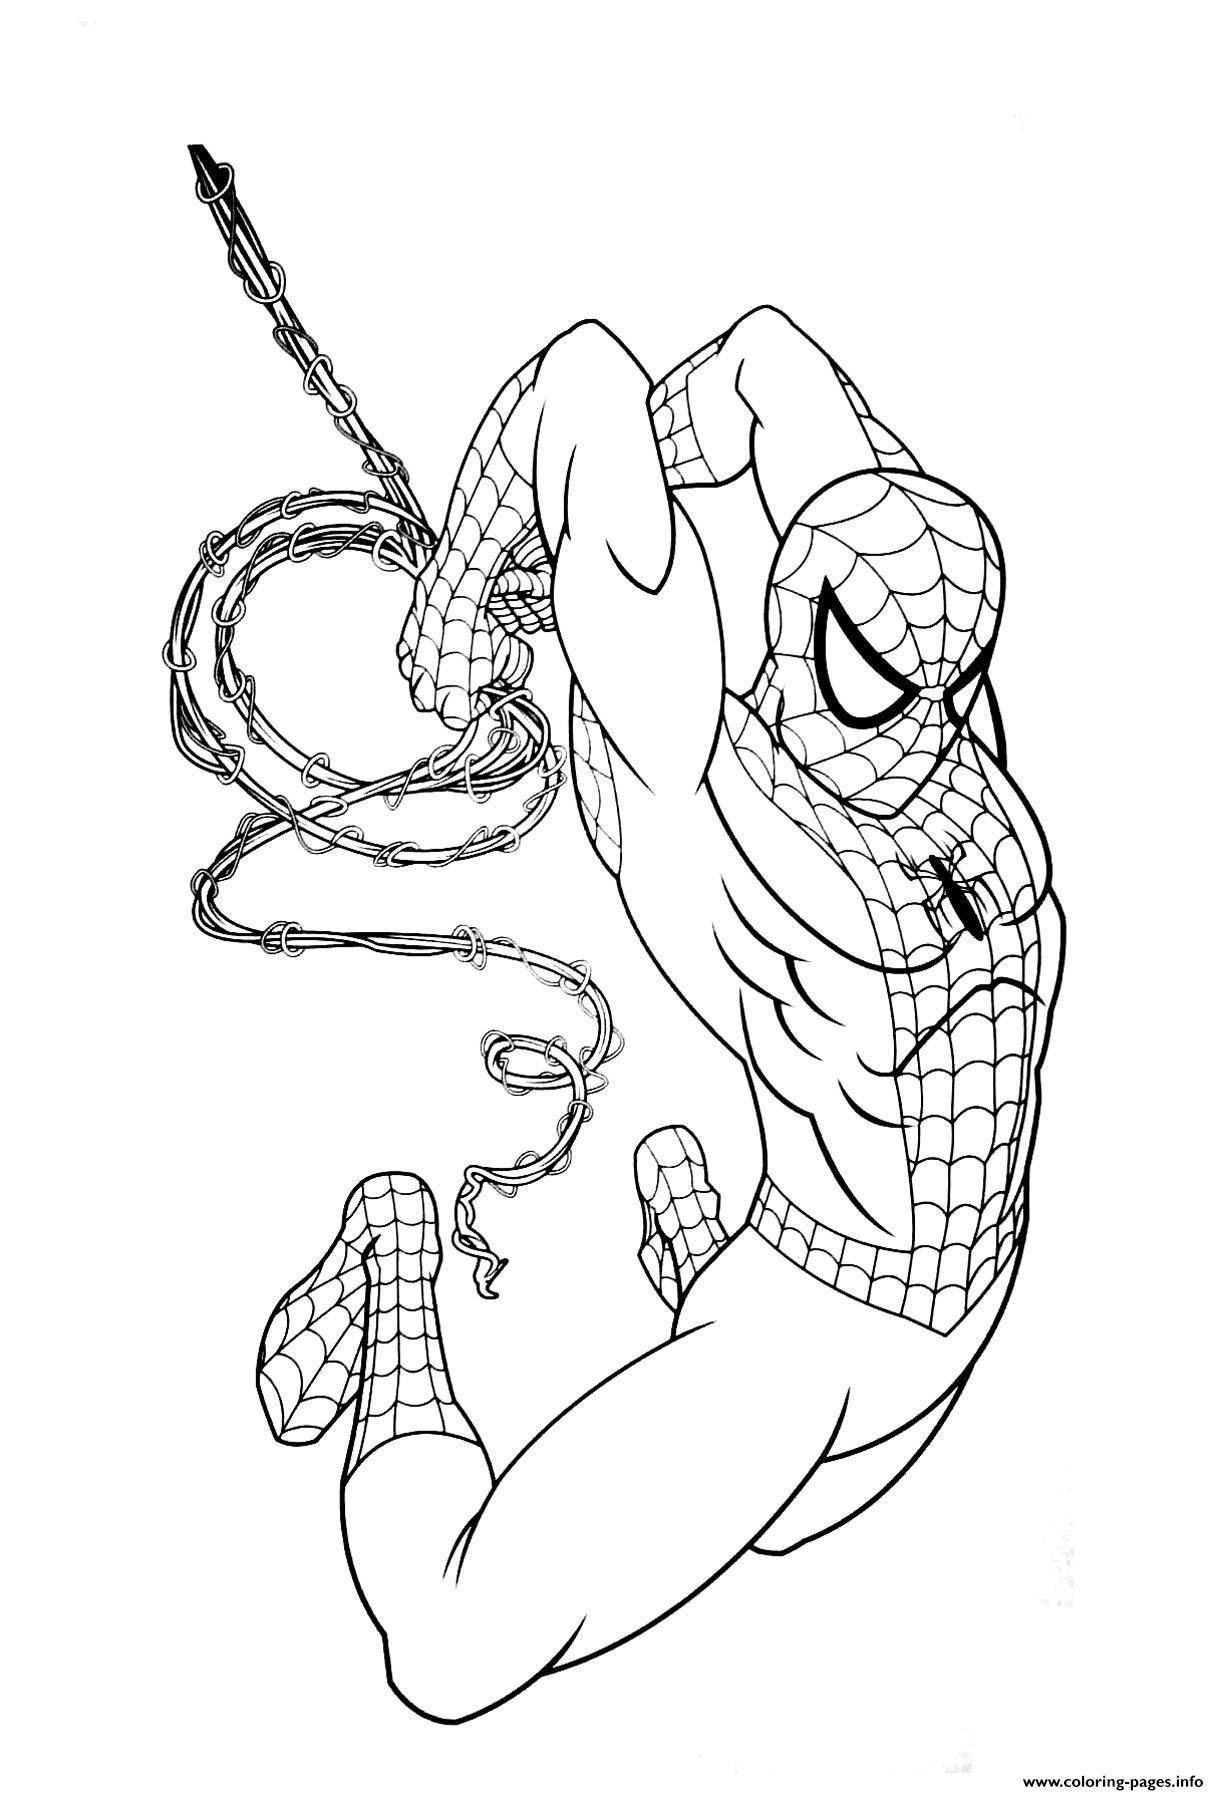 Spiderman Coloring Superhero Coloring Pages Superhero Coloring